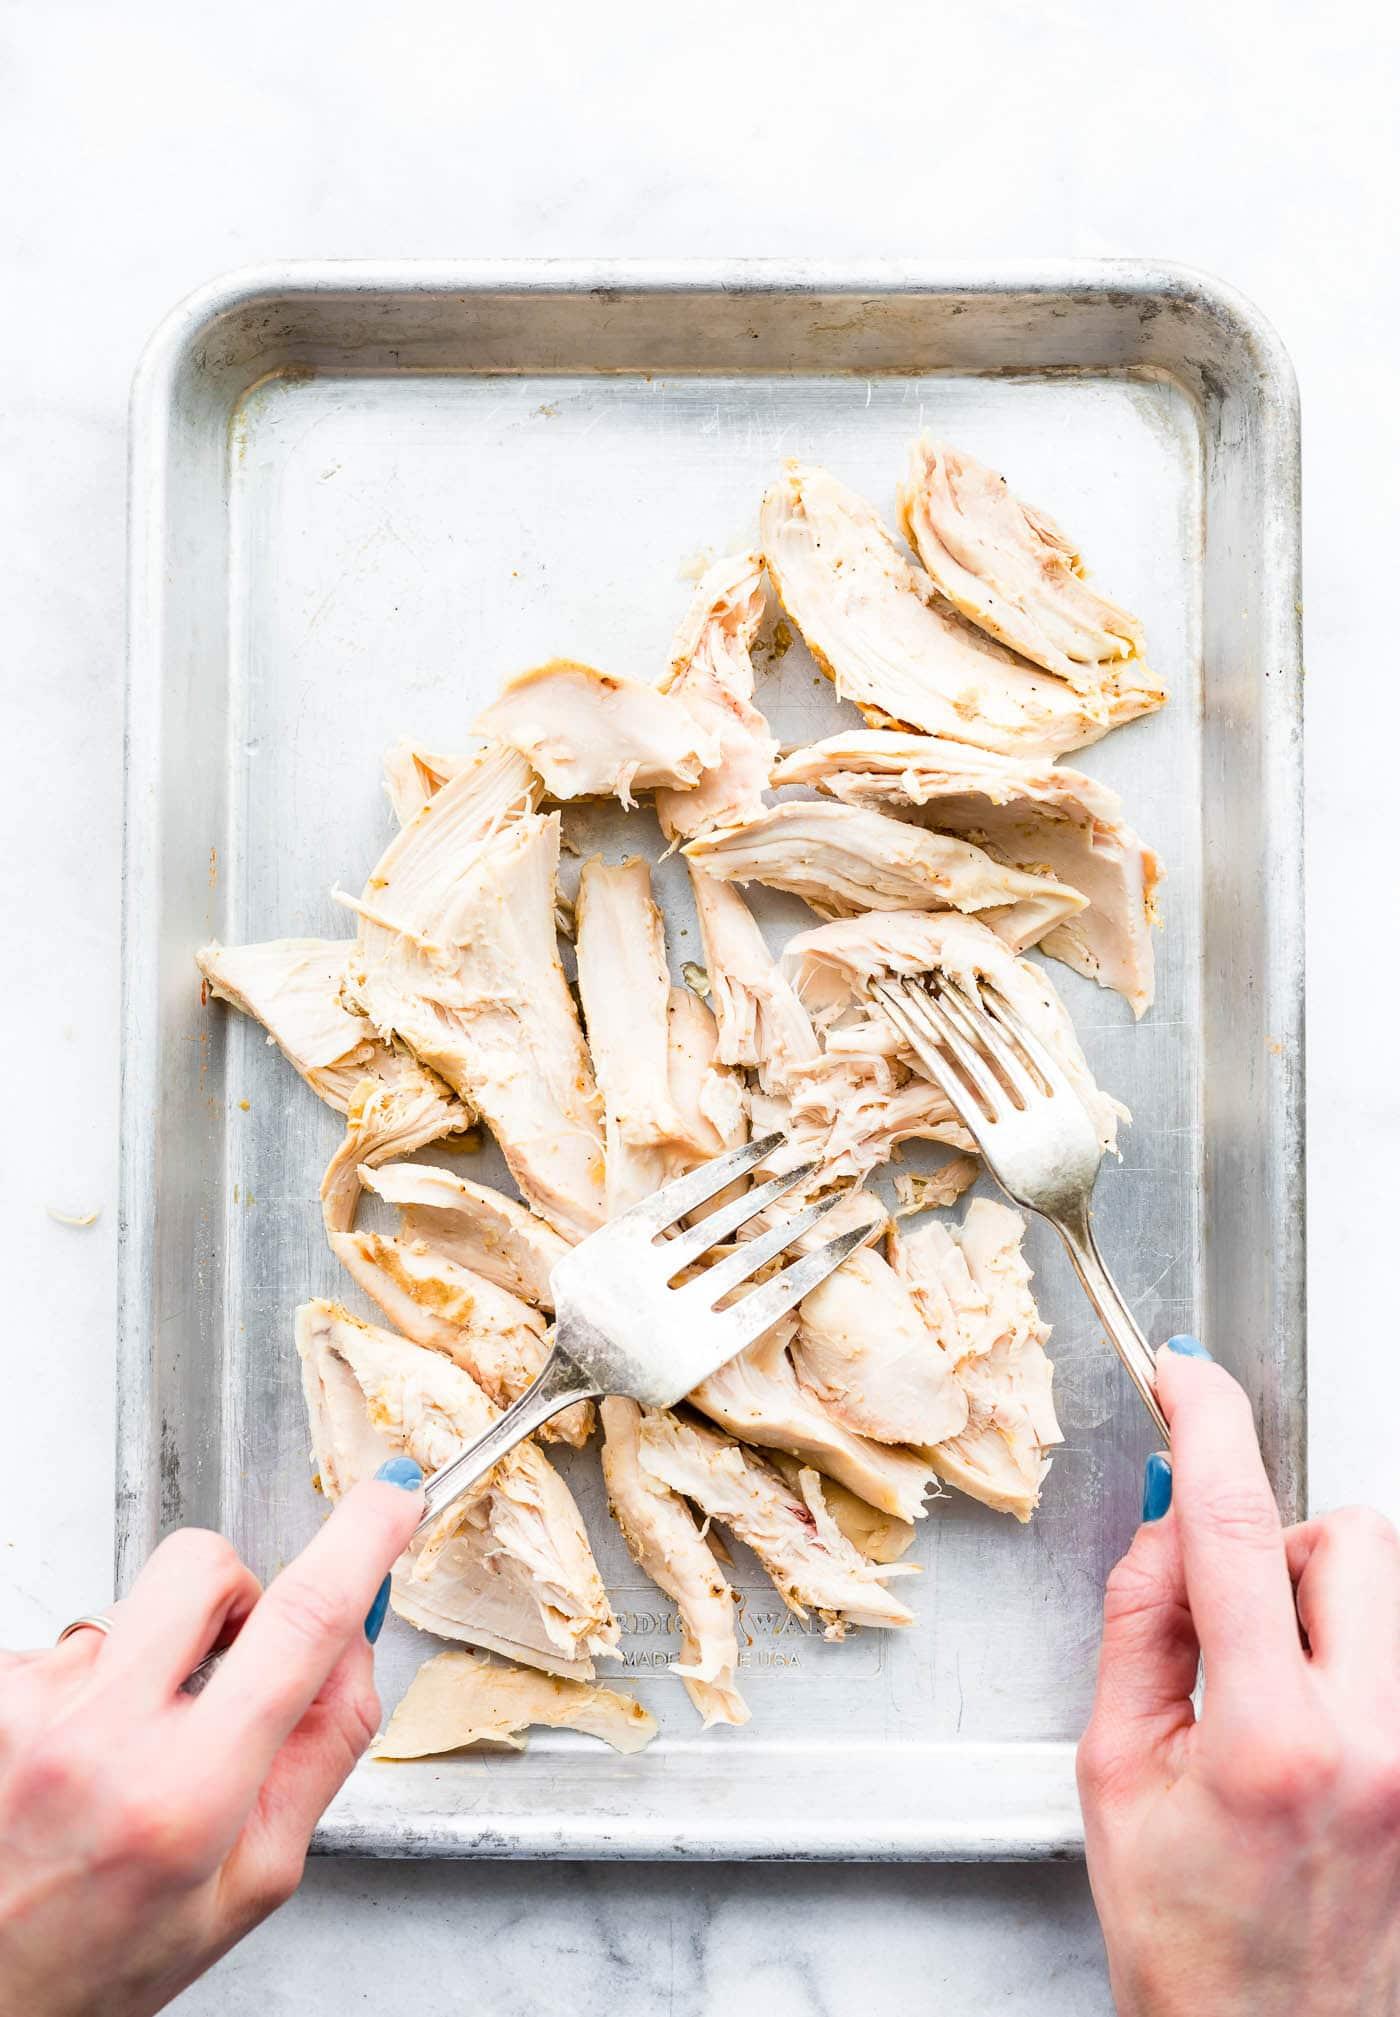 Overhead image shredding chicken breast on a sheet pan.